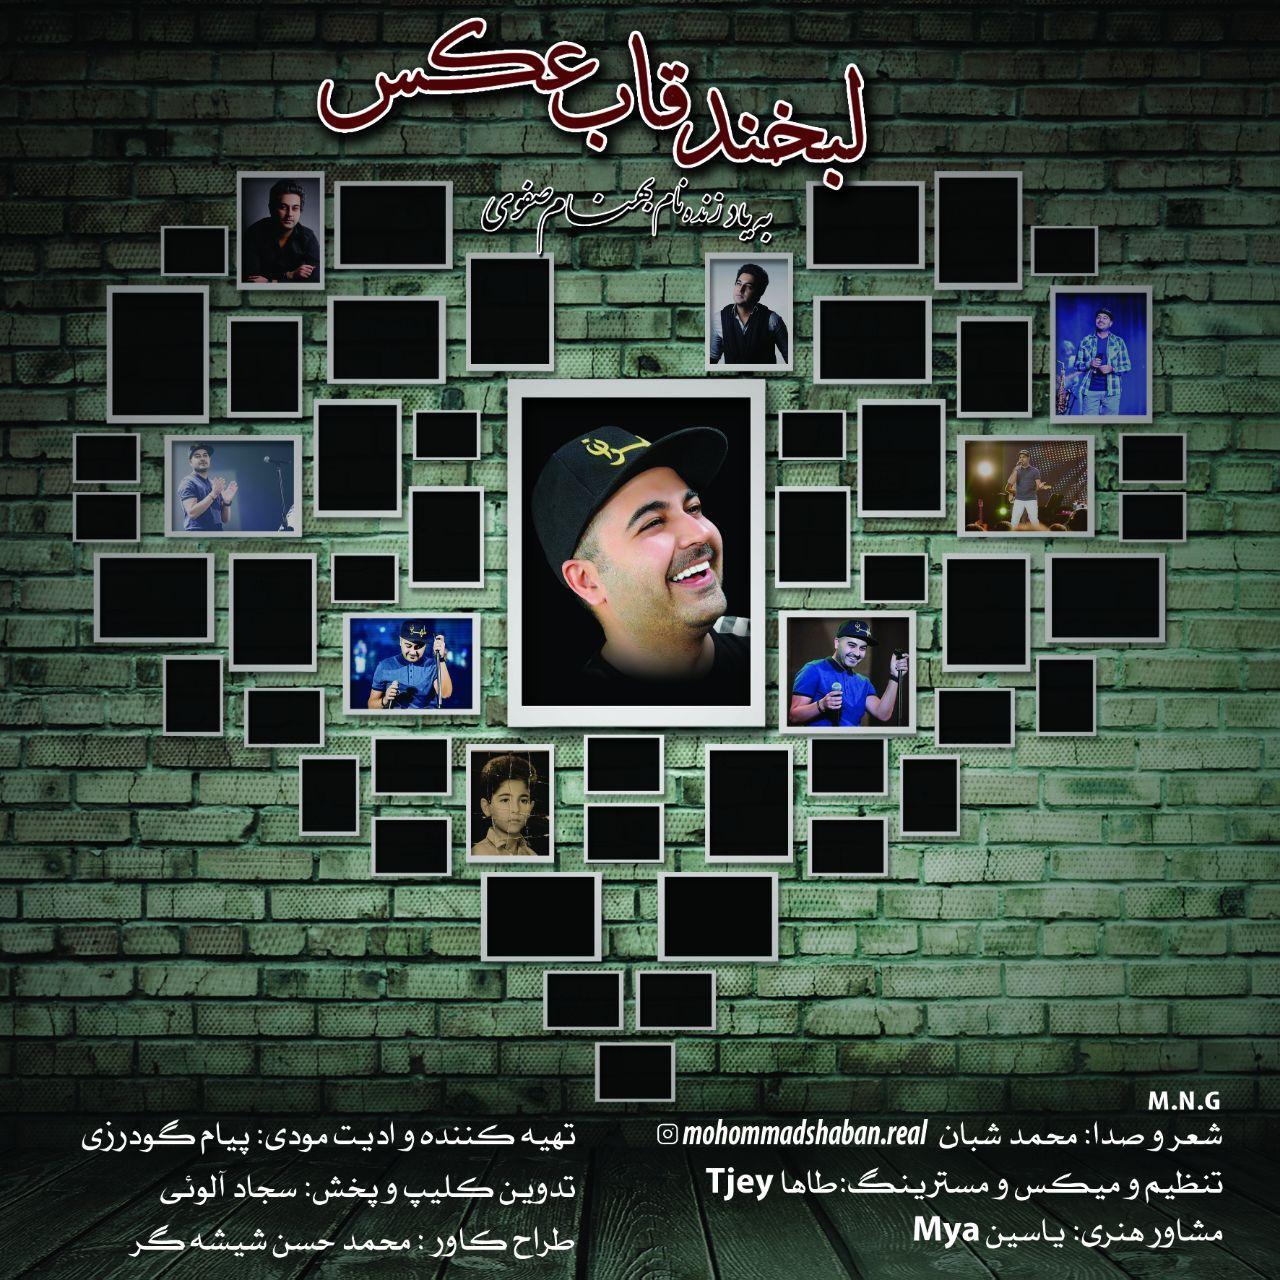 Mohammad Shaban – Labkhande Ghabe Aks